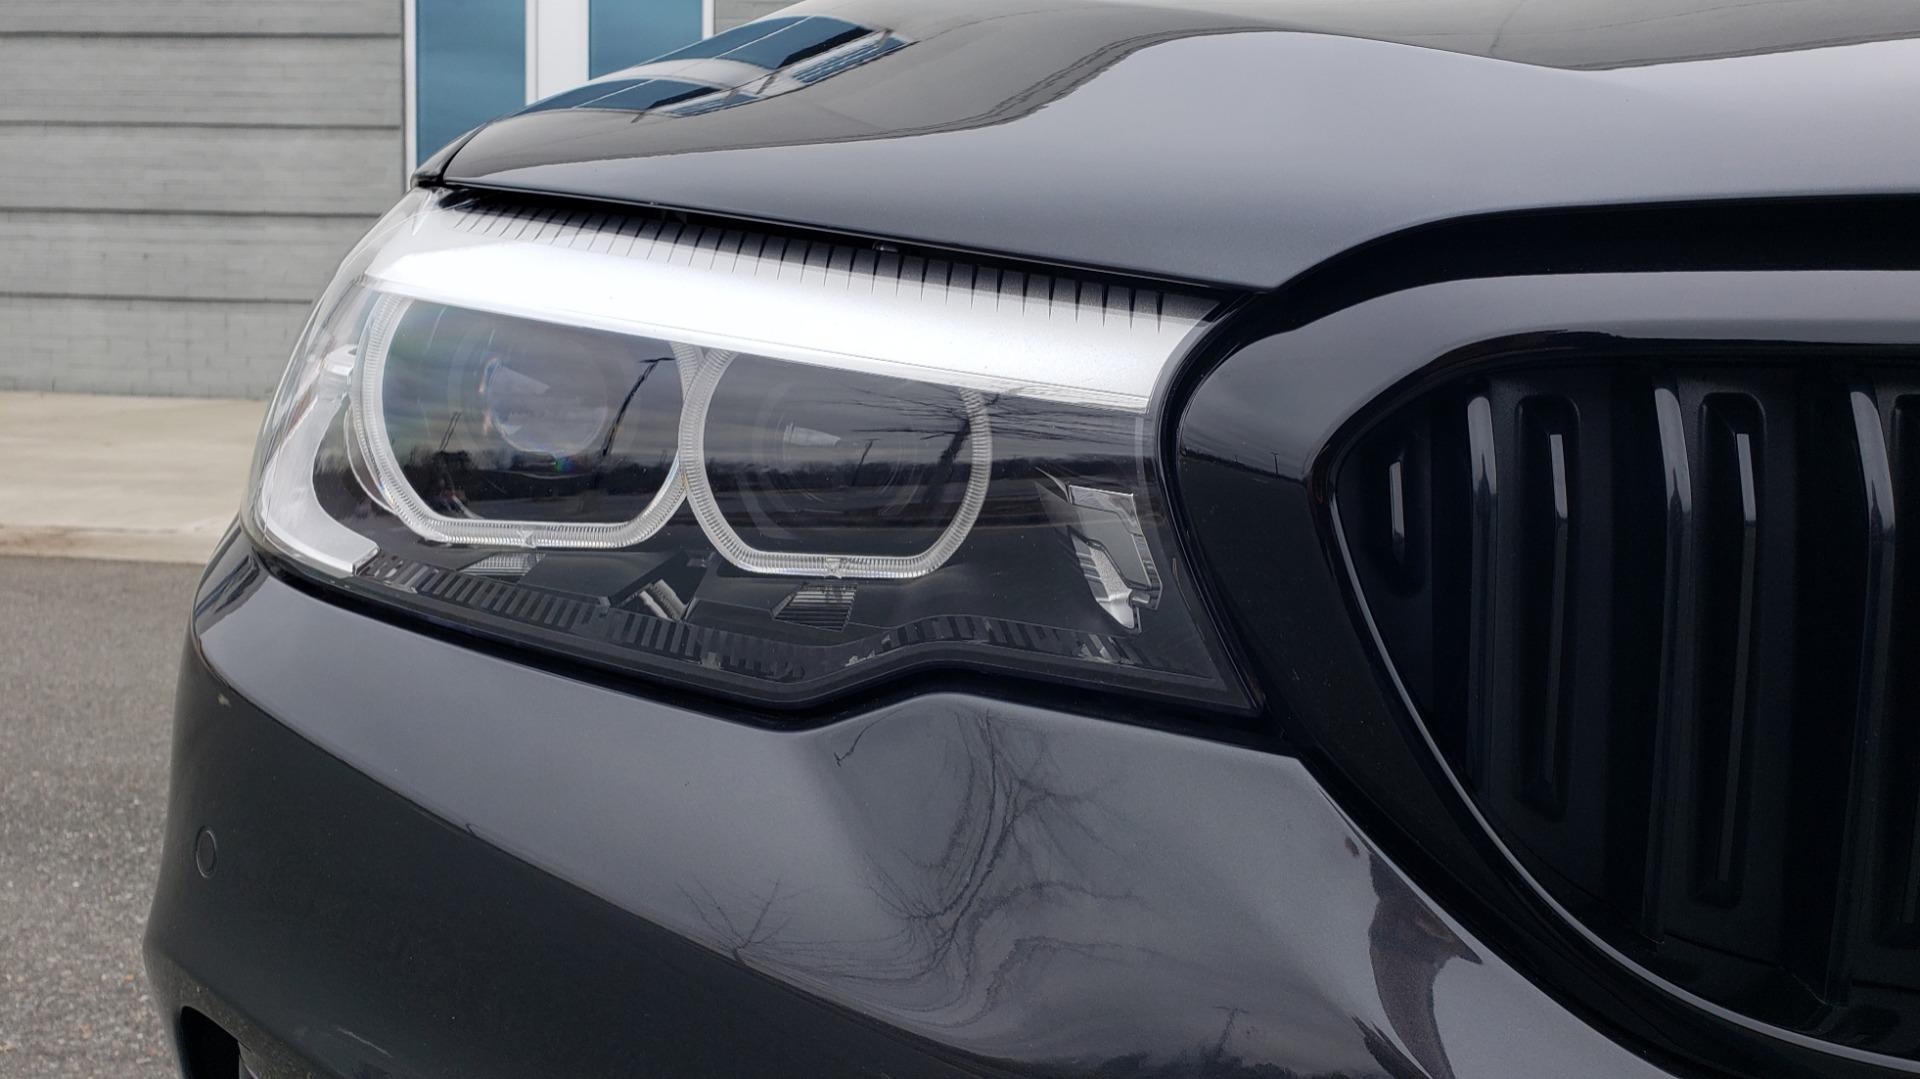 Used 2017 BMW 5 SERIES 530IXDRIVE / PREM PKG / DRVR ASST PLUS / CLD WTHR / APPLE CARPLAY for sale Sold at Formula Imports in Charlotte NC 28227 20